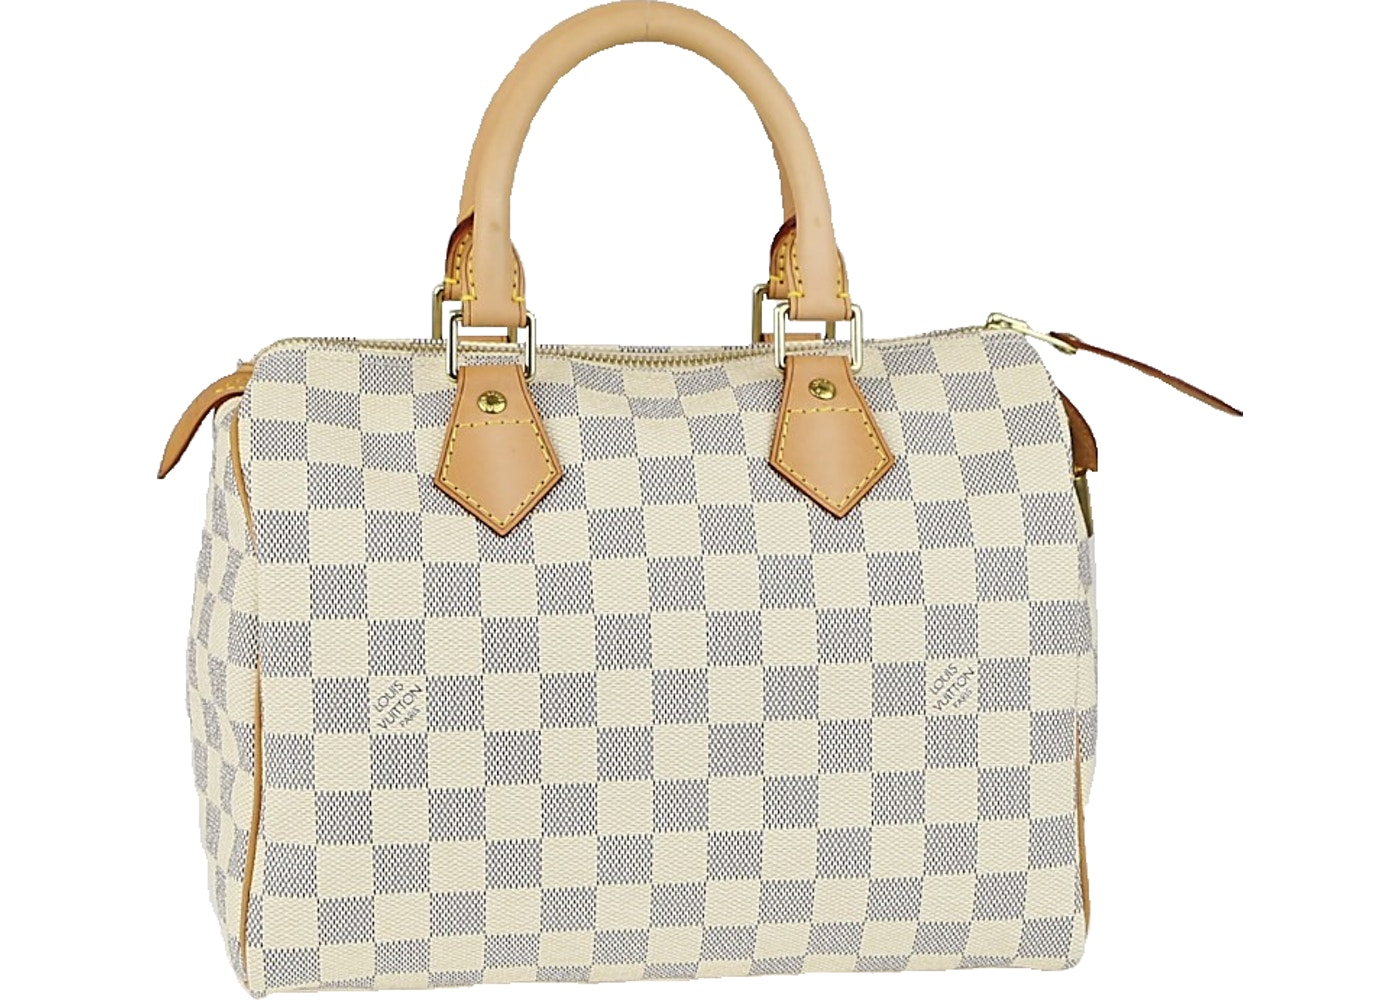 f5d44dc5c1b2 Louis Vuitton Speedy Damier Azur 25 Cream Blue